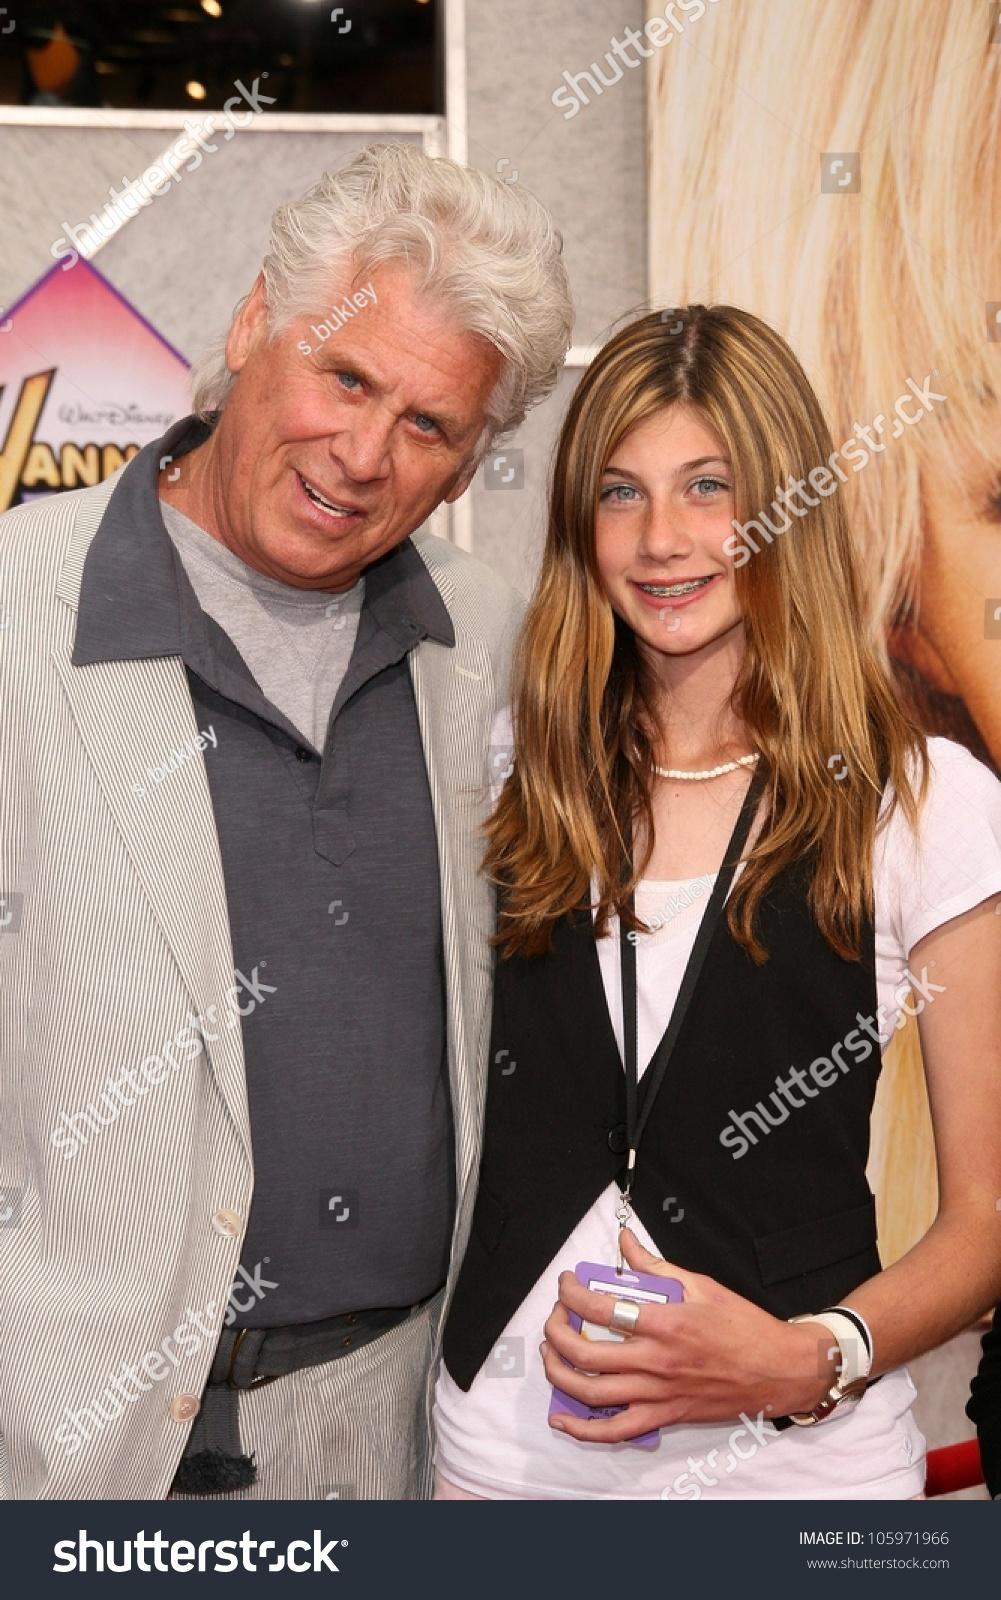 Barry Bostwick His Daughter Chelsea Los Stockfoto (Jetzt bearbeiten ...